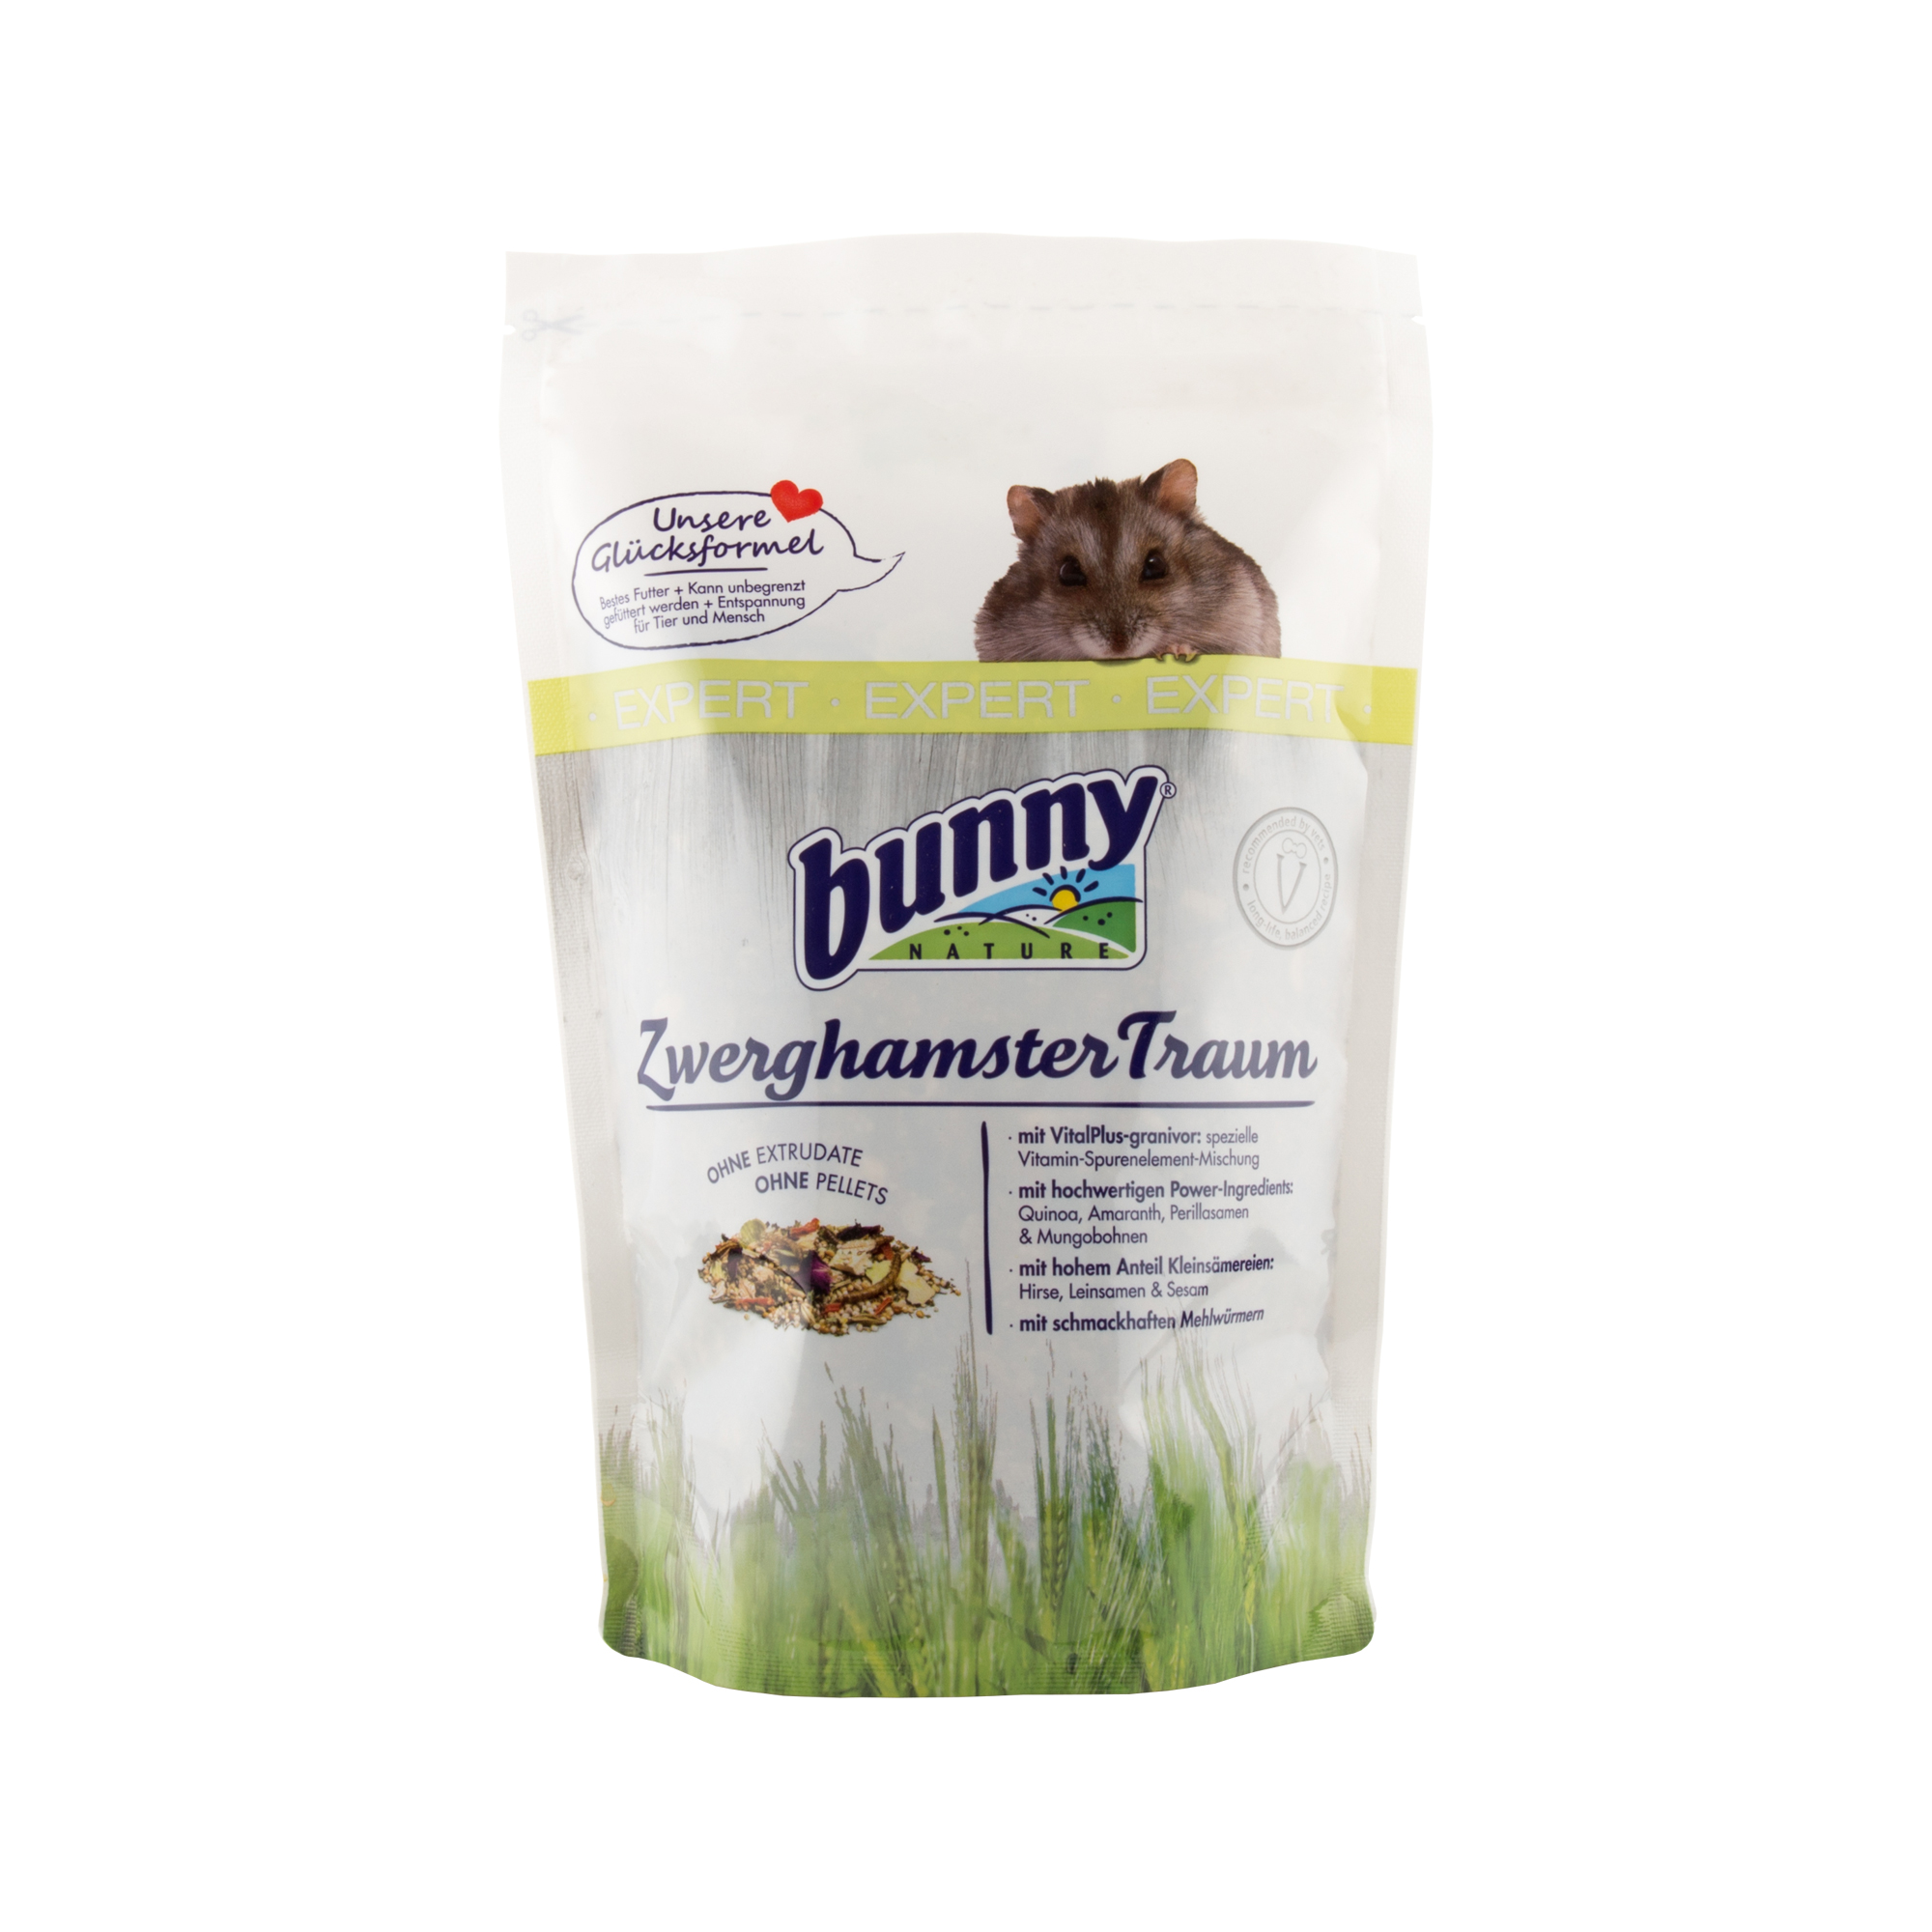 Bunny Nature - Rêve de hamster nain - Expert